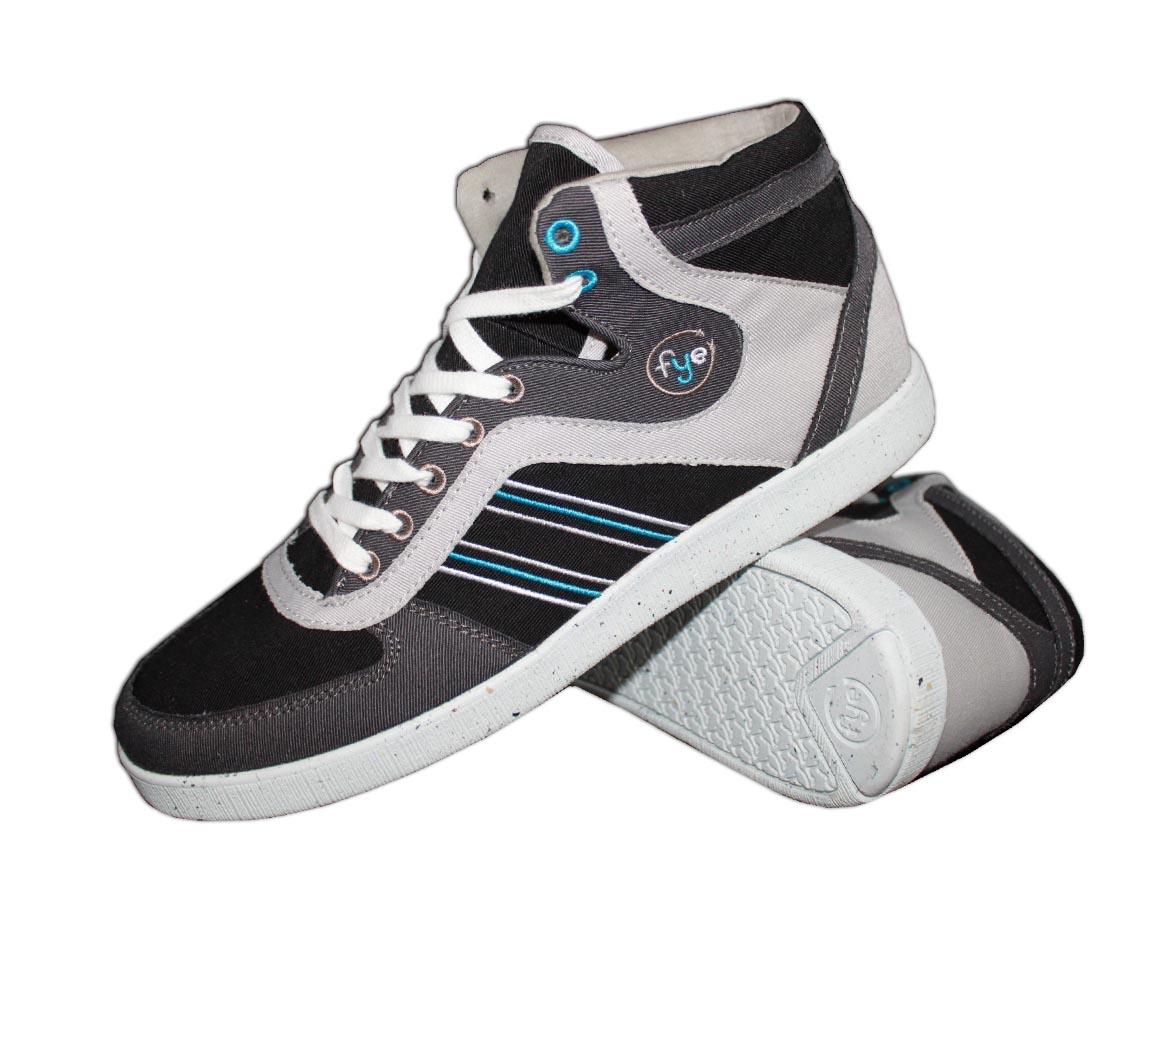 online store 8be20 d9467 Chaussures Nike Dunk De Cl chaussure Americana Basketball Basket qCqw48S